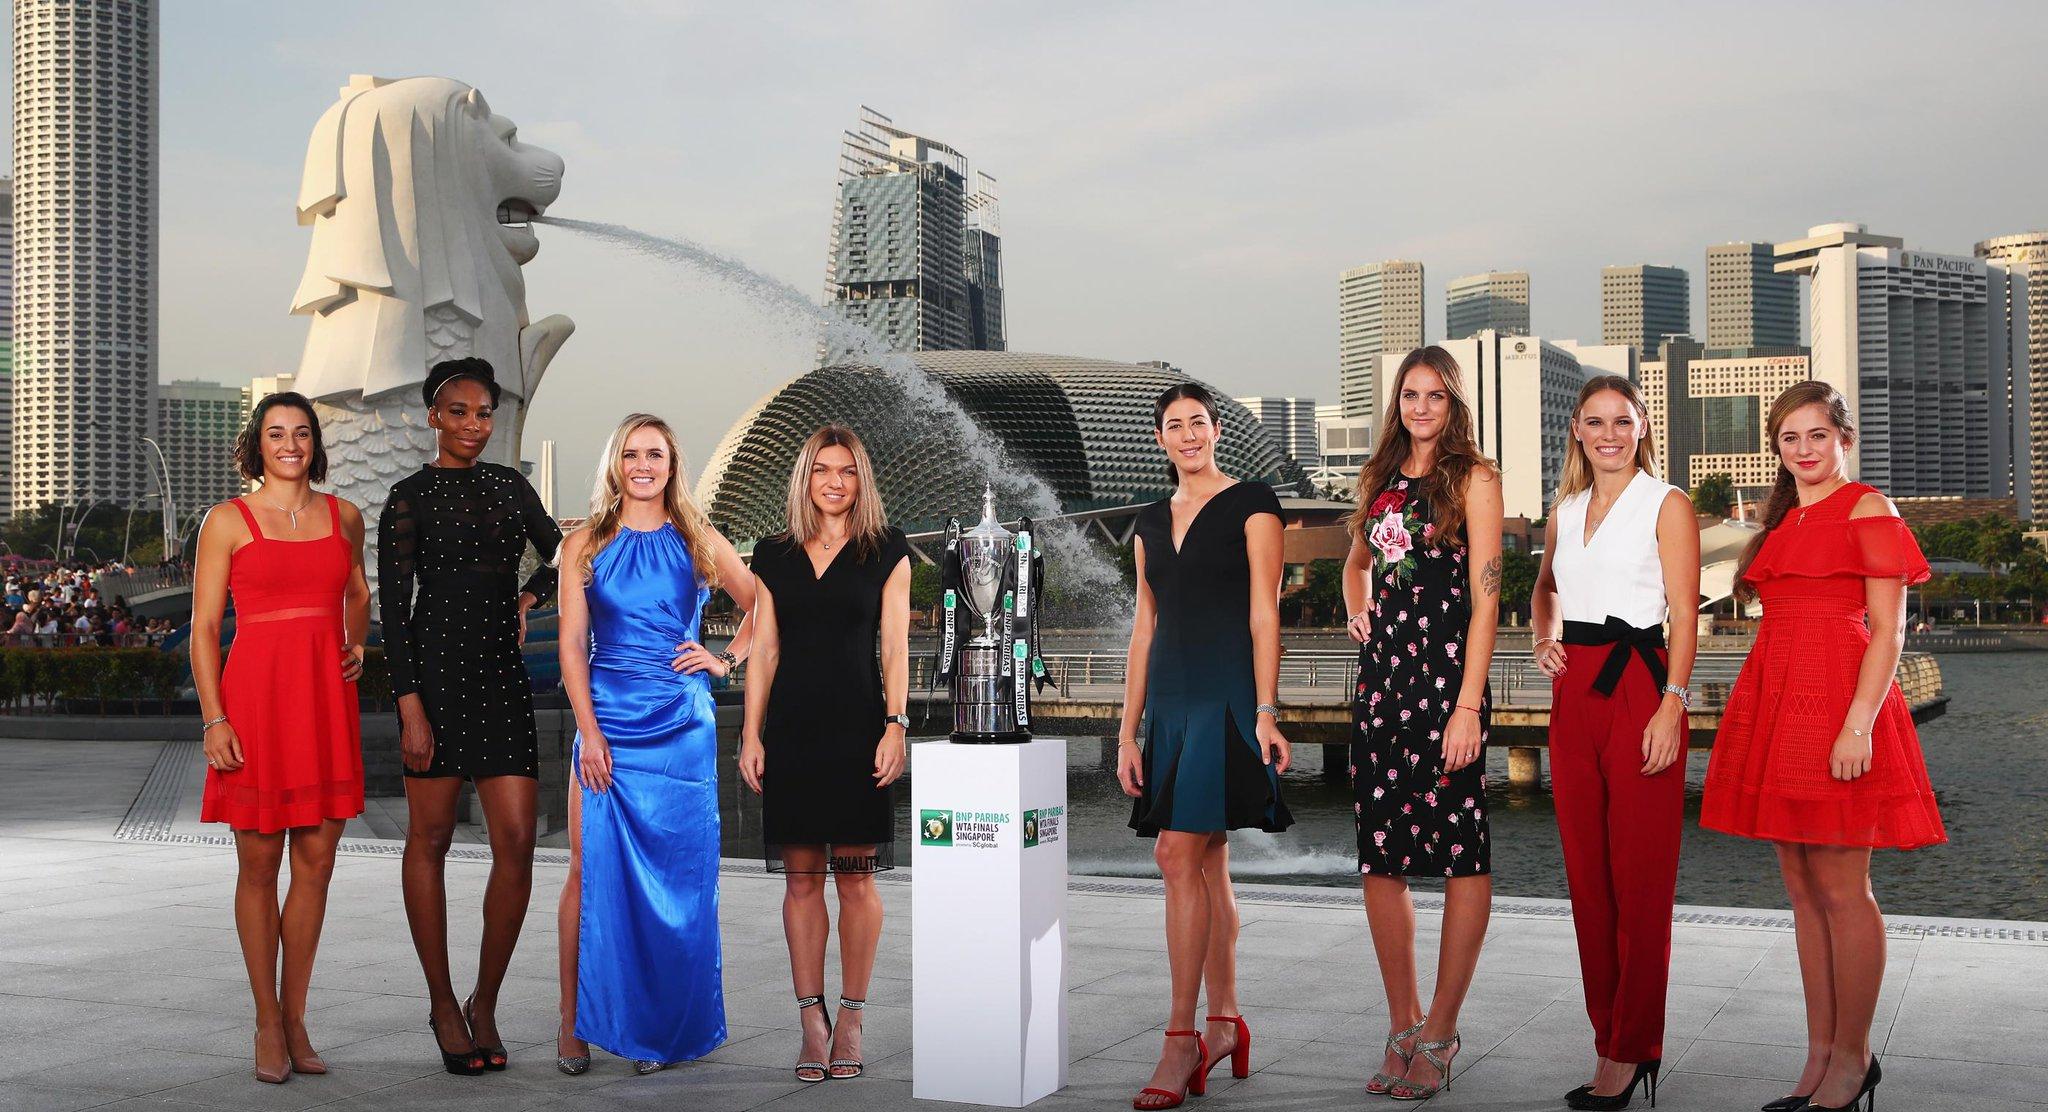 Your 2017 #WTAFinals Iconic Photo! ✨ https://t.co/fFFIARaM2m